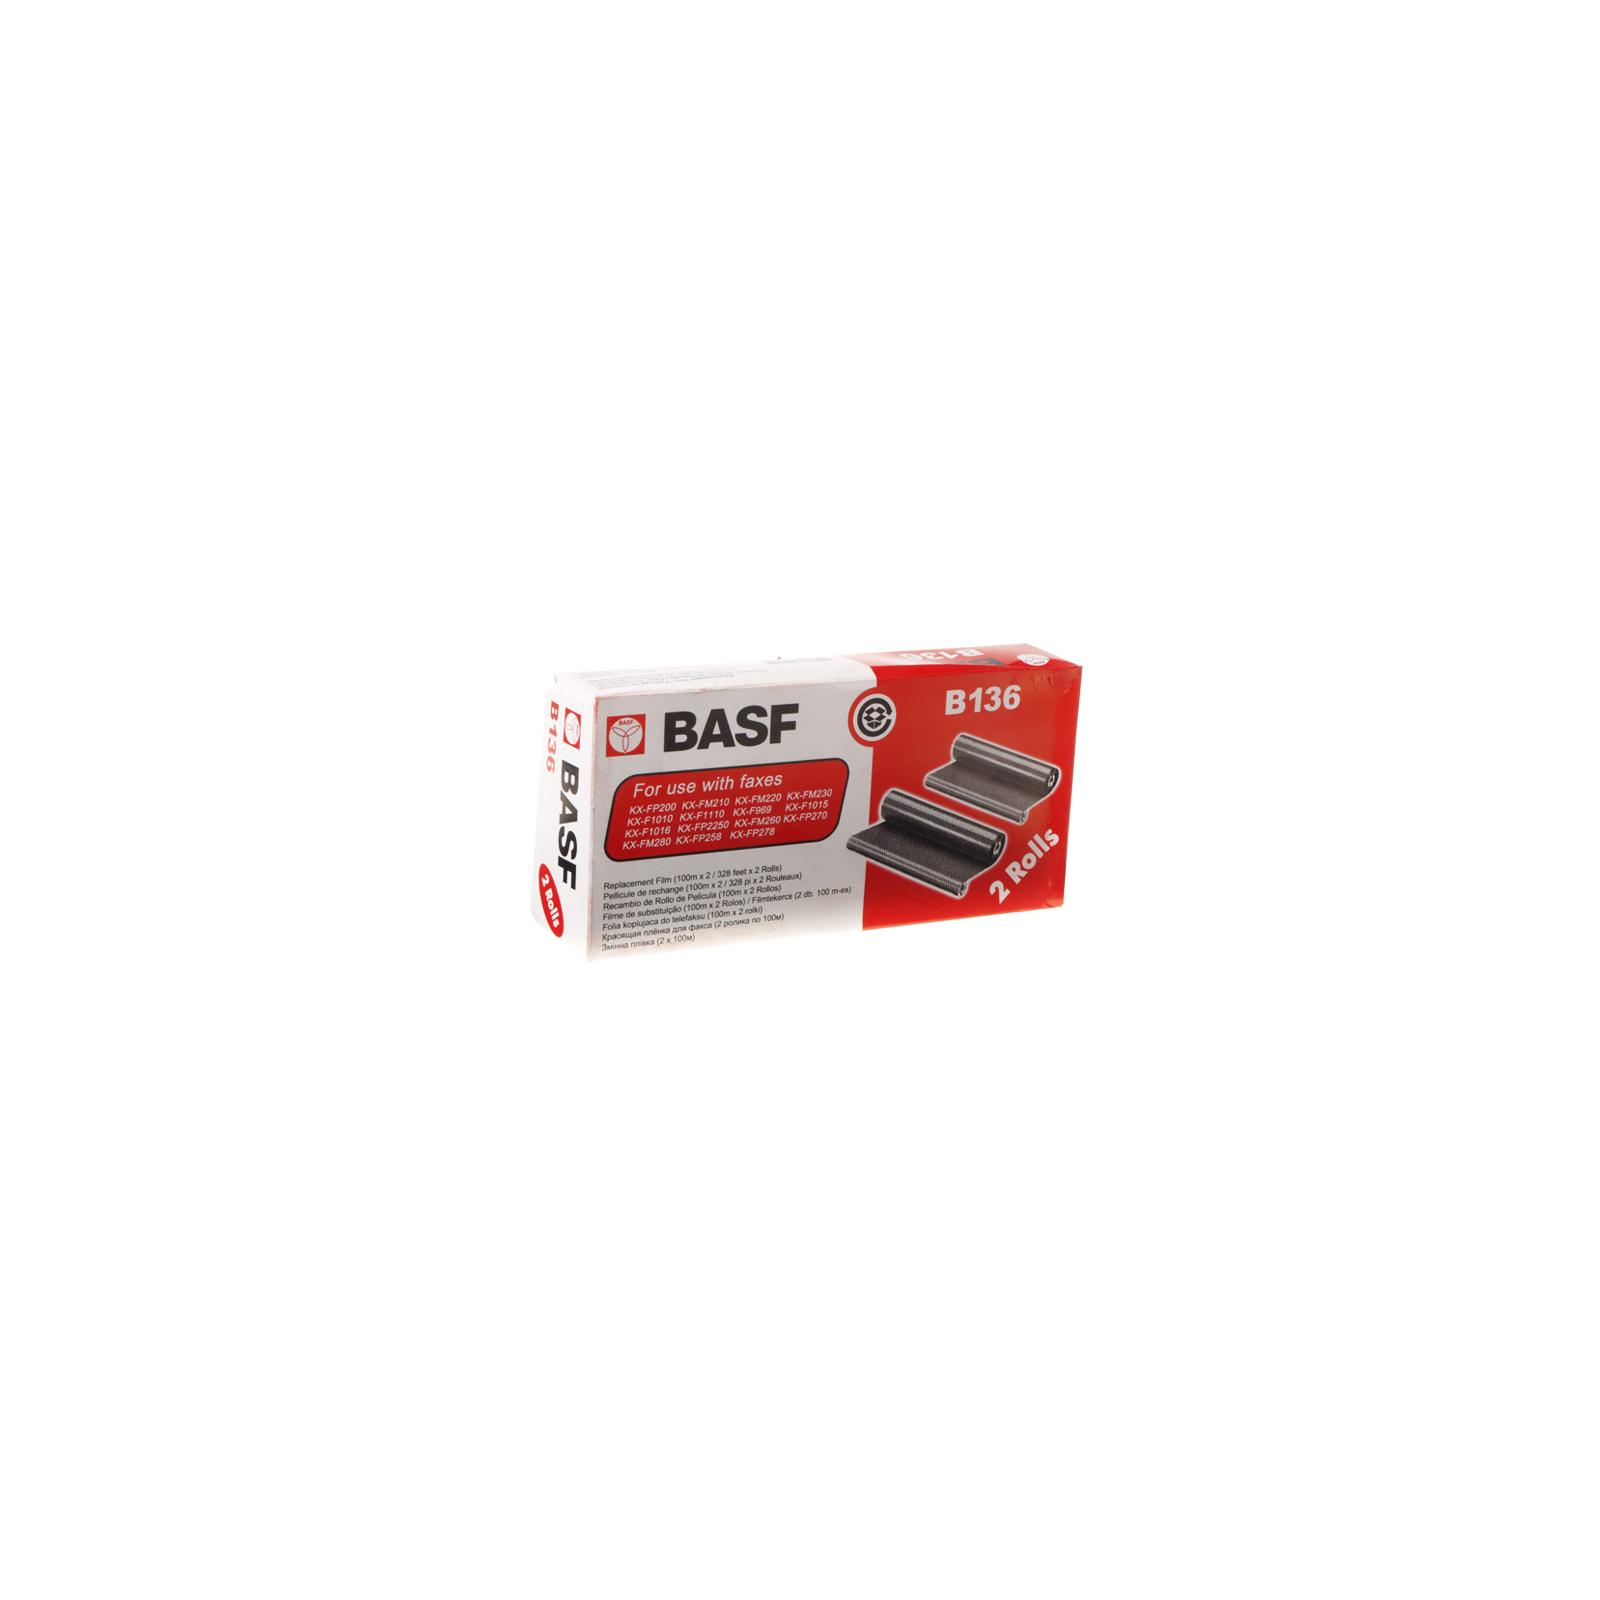 Пленка для факса Panasonic KX-FA136a (KX-F1010/F1110/KX-FP105/200/250) BASF (B-136)